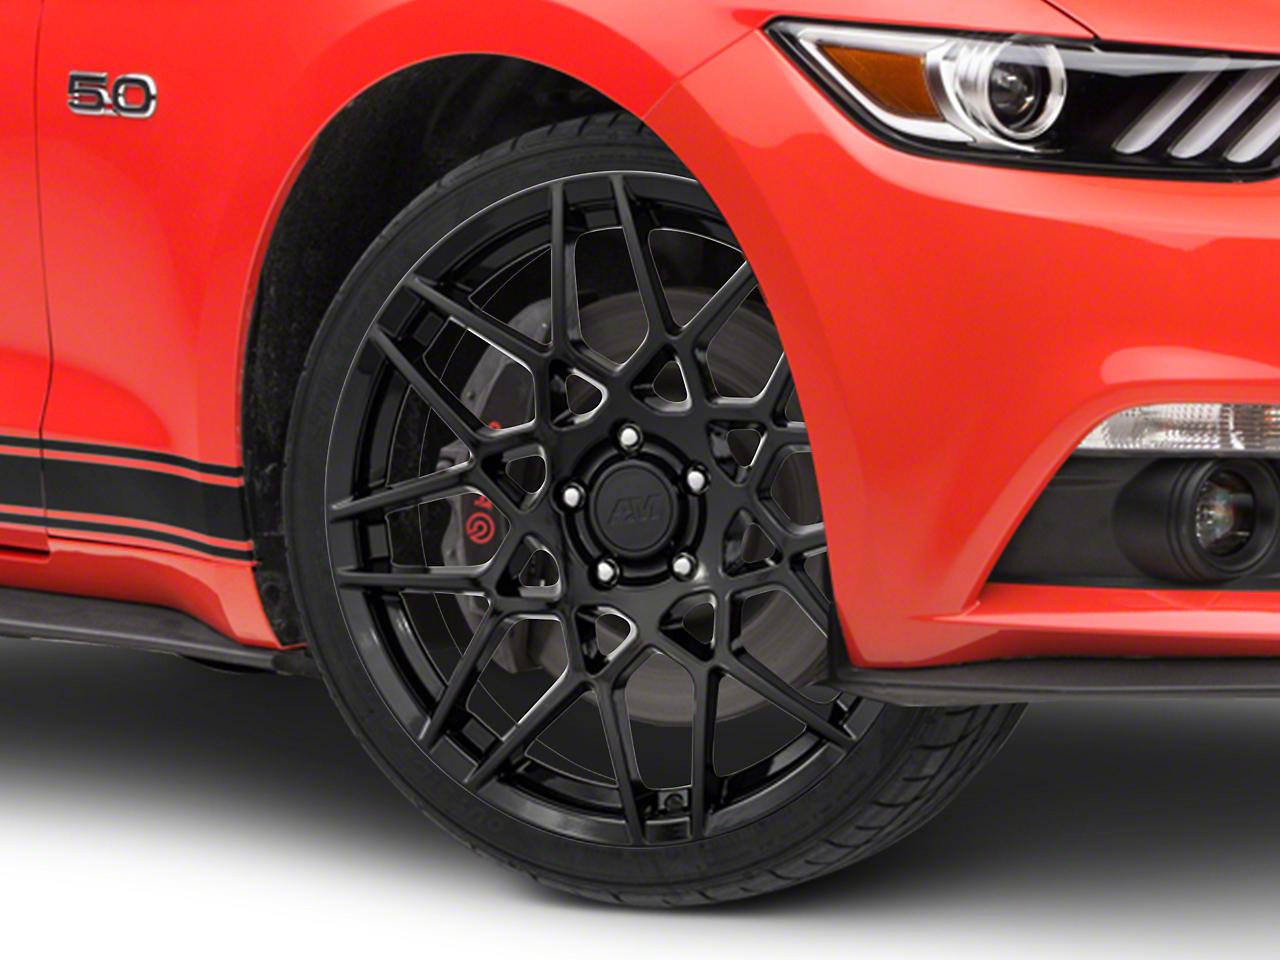 2013 GT500 Style Gloss Black Wheel - 19x8.5 (15-17 All)